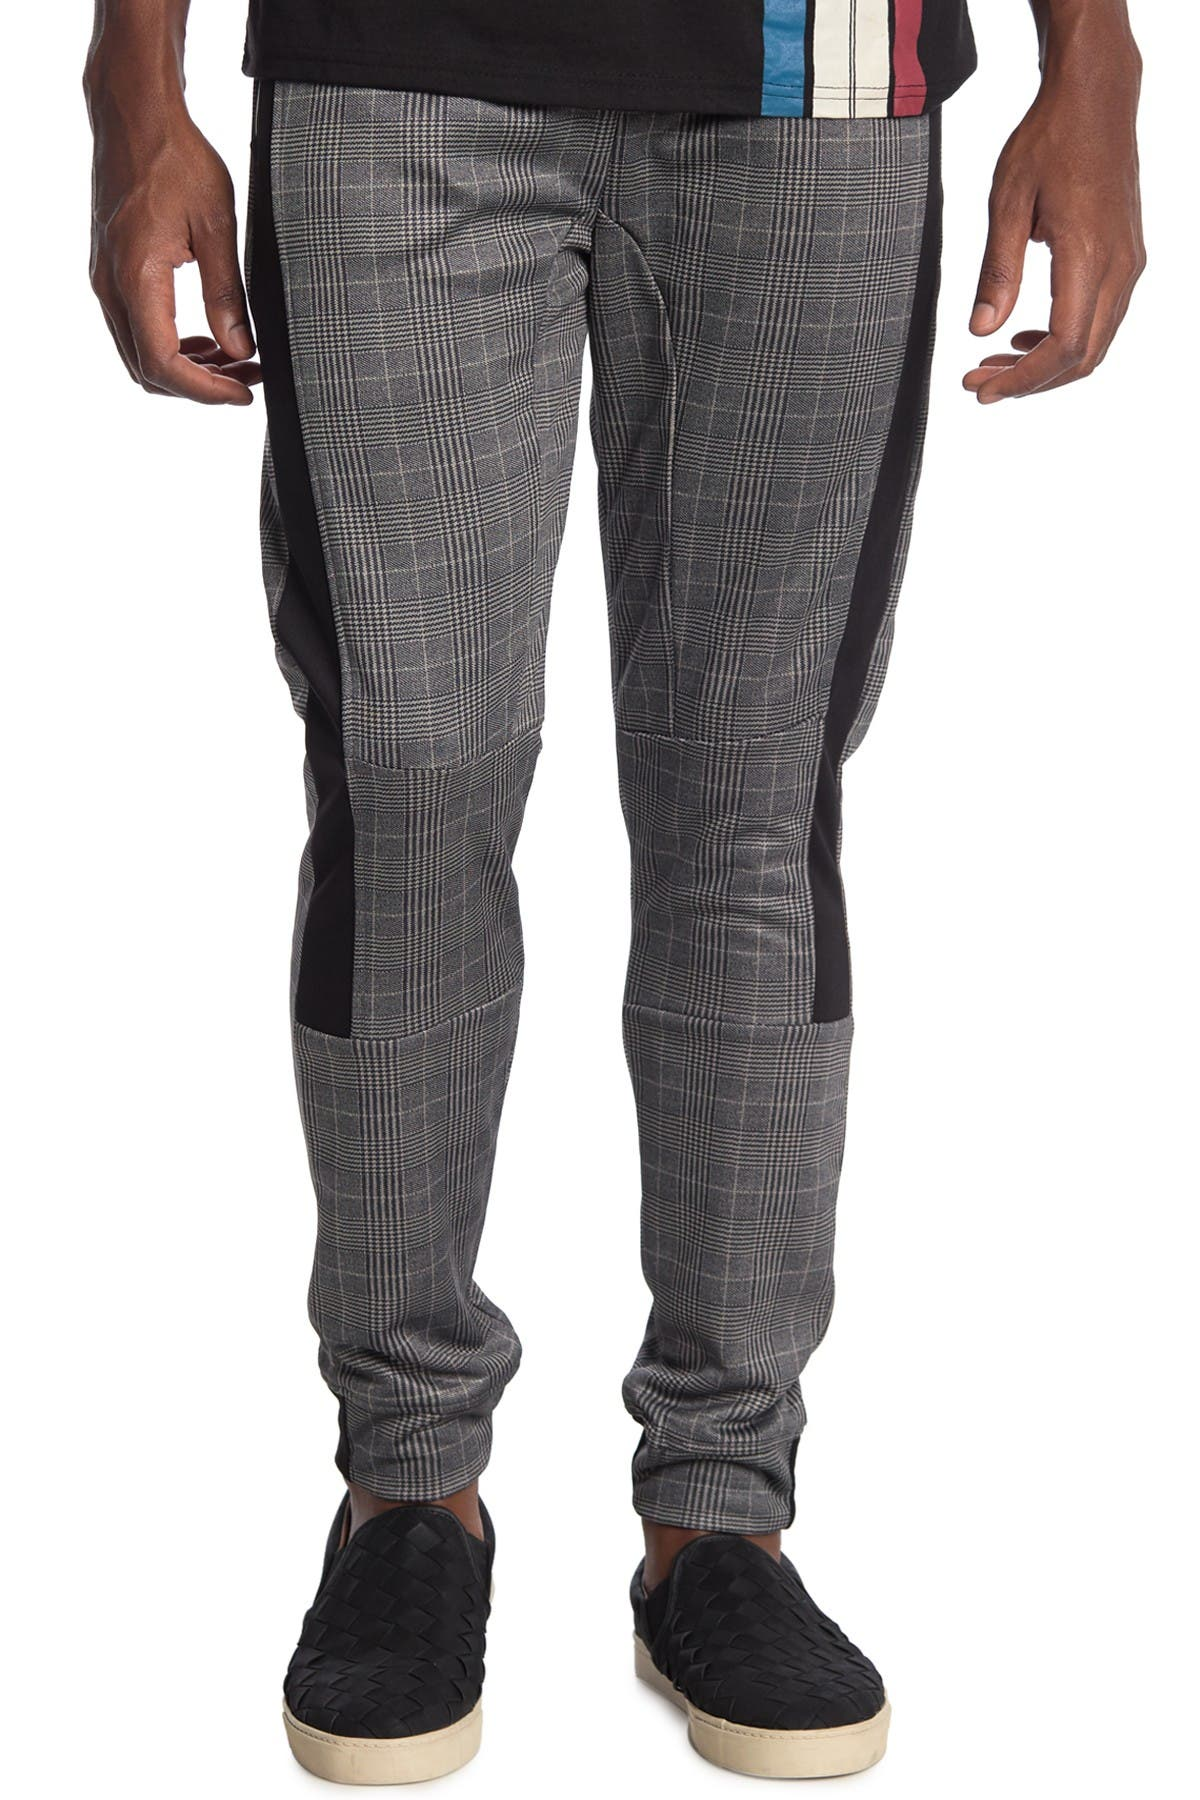 Image of Burnside Plaid Drawstring Pants